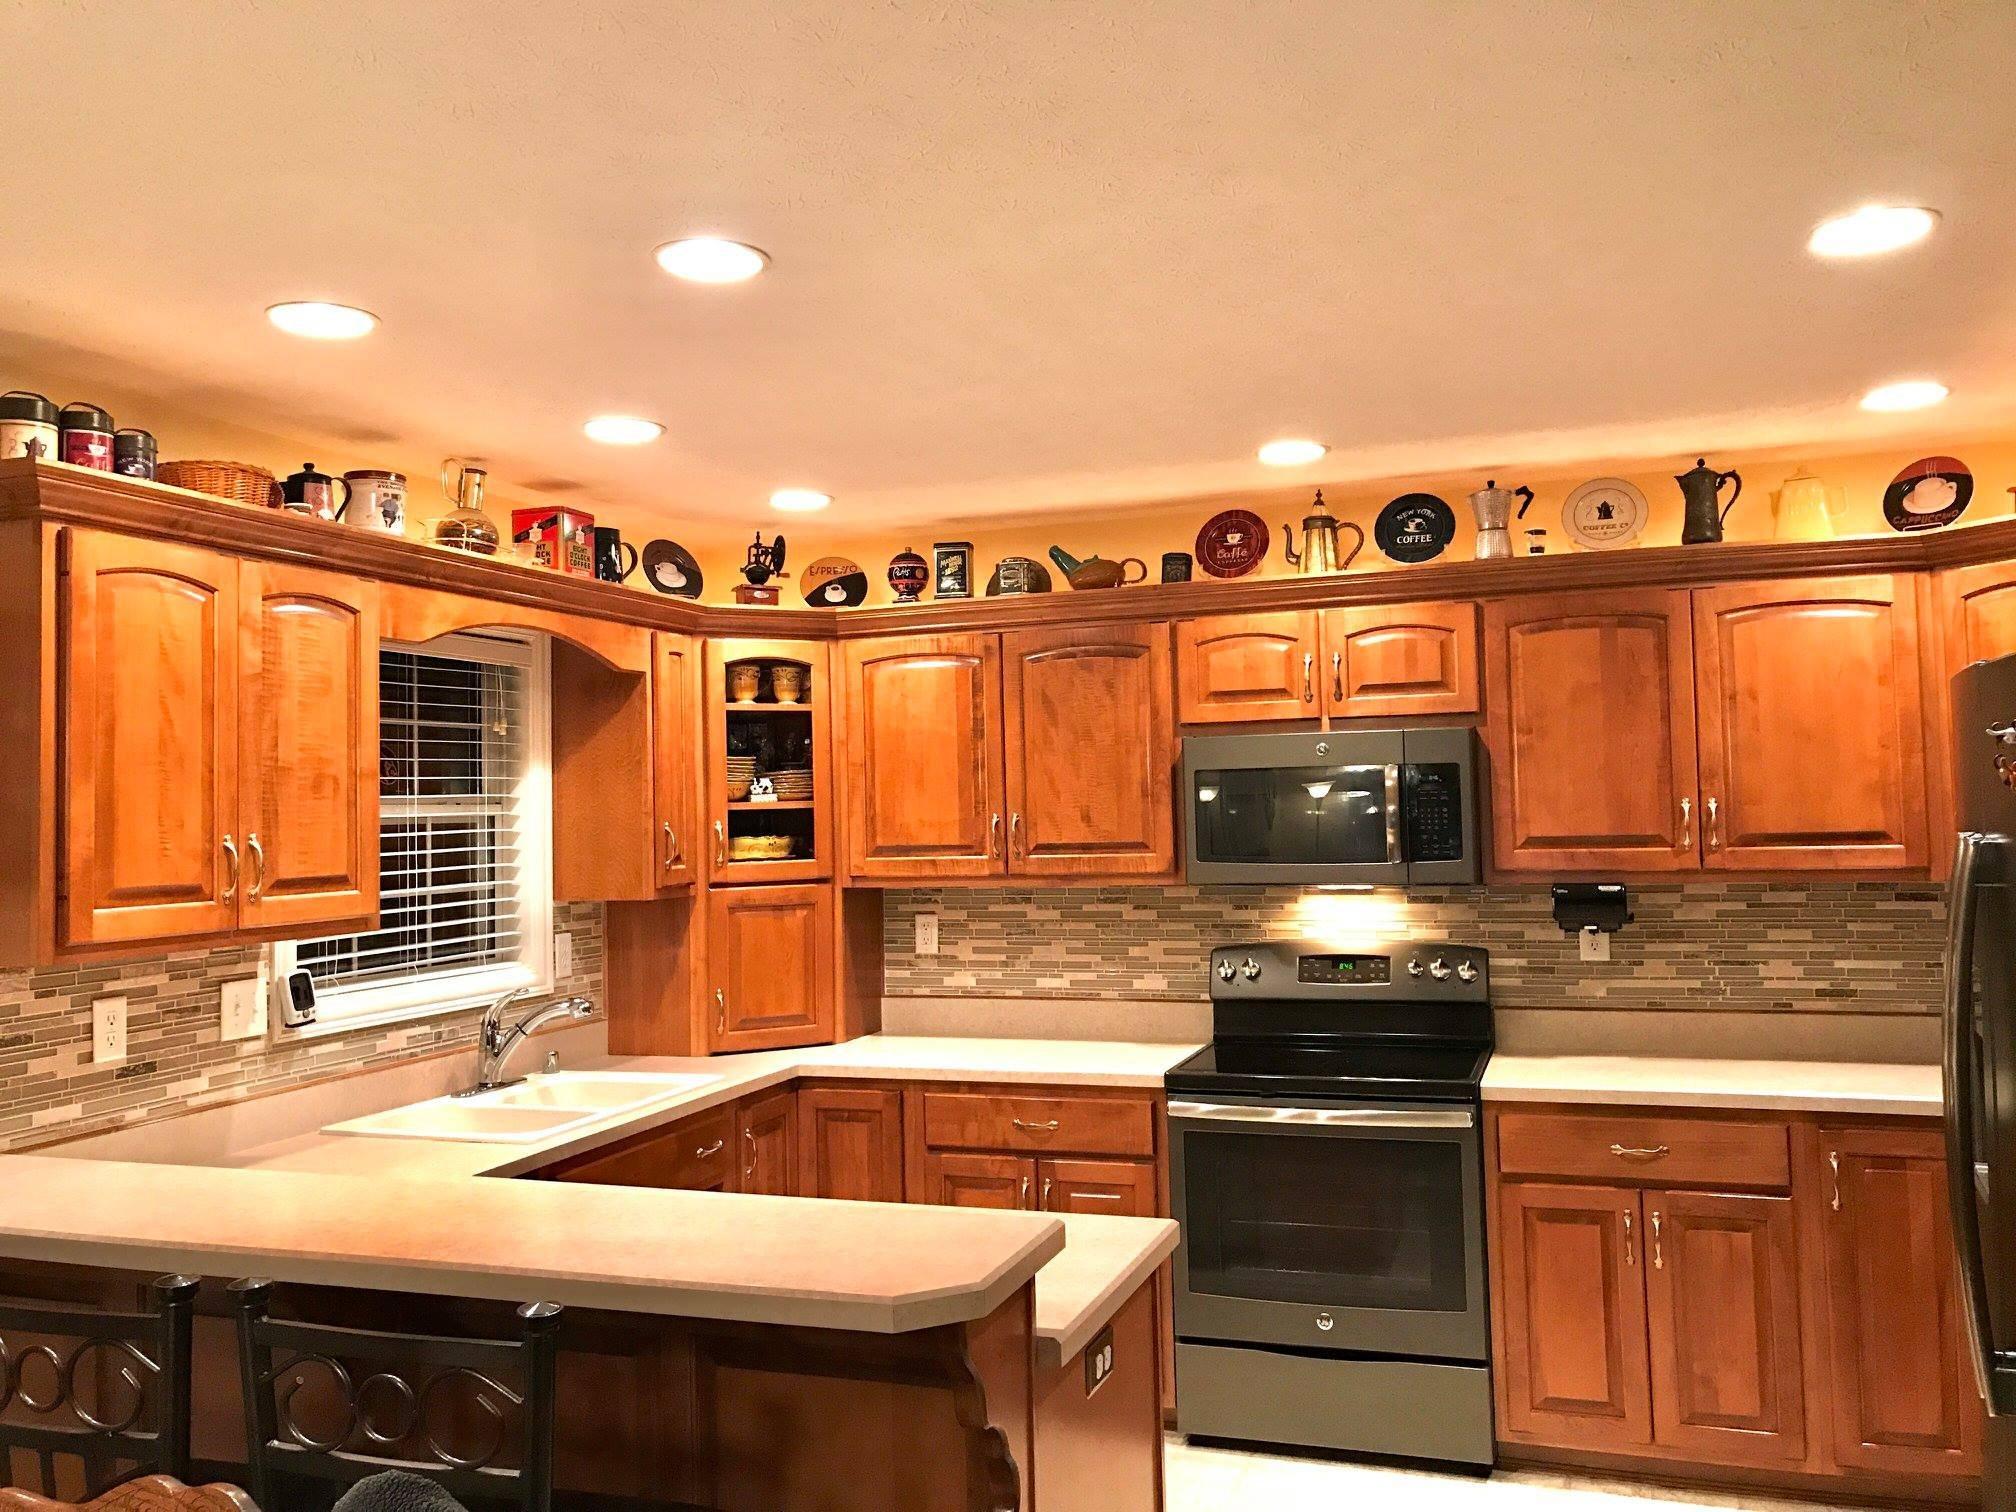 Blake Kitchen Remodel and Backsplash 2